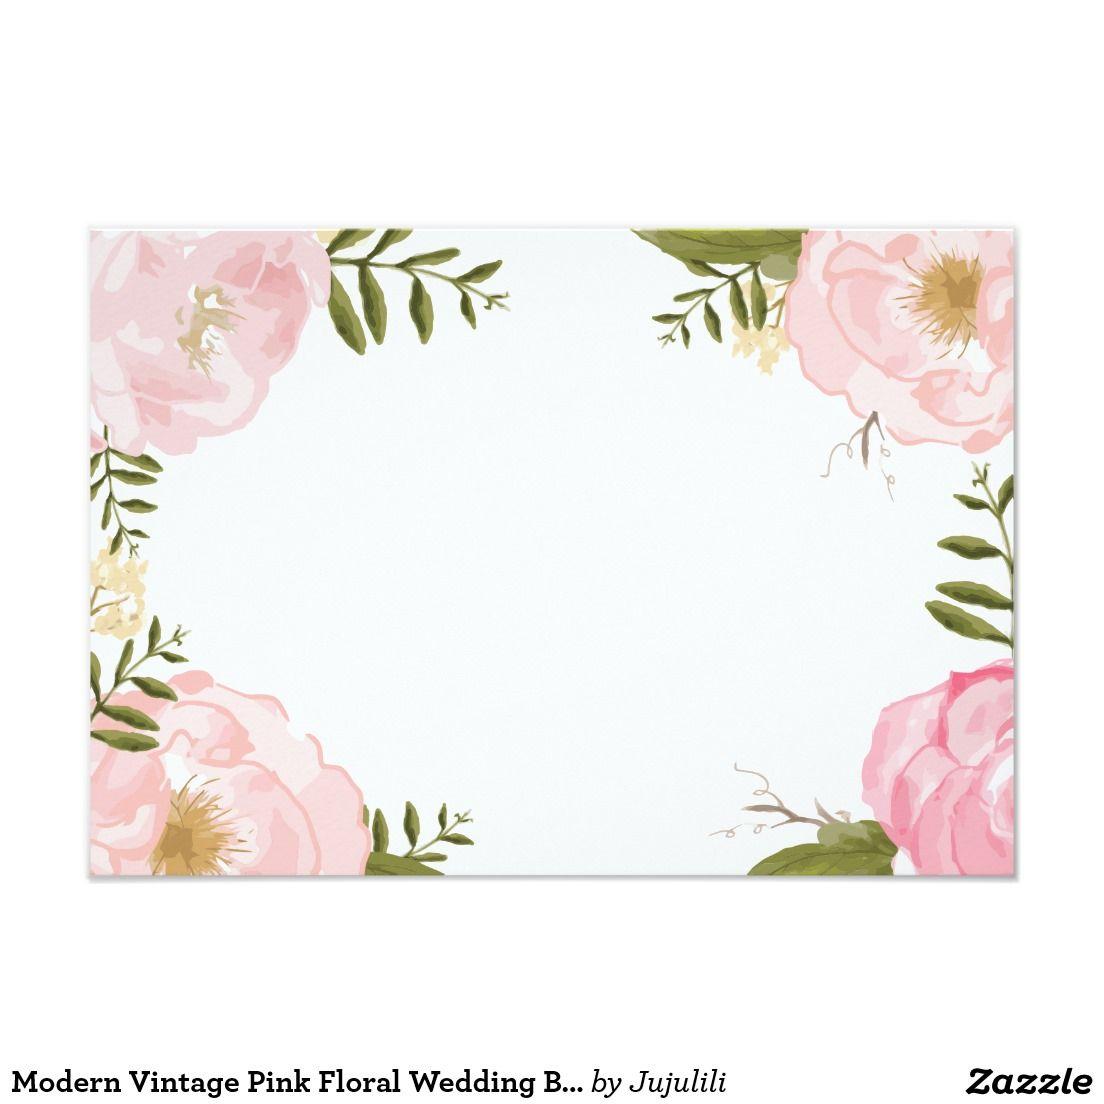 Modern vintage pink floral wedding blank card floral for Wedding invitation designs fuchsia pink